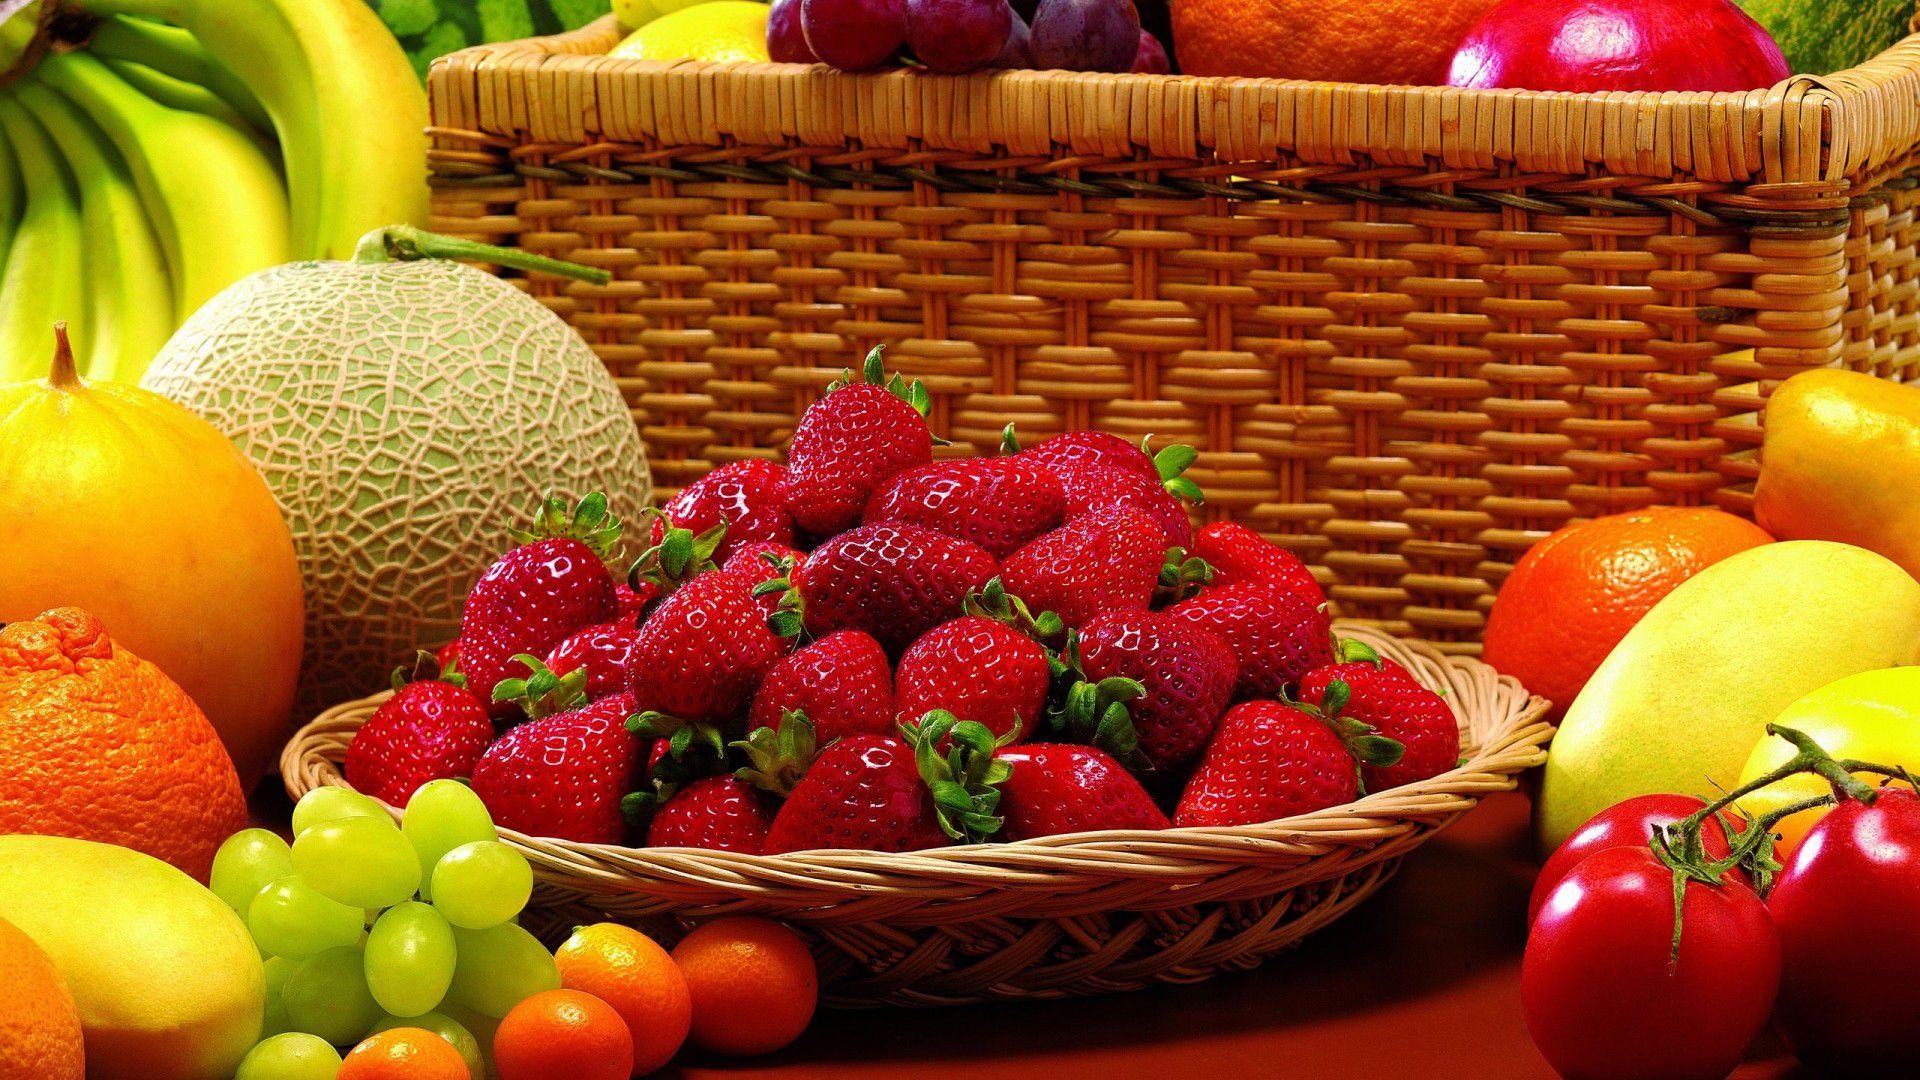 Delicious Food Desktop Wallpapers Free Delicious Food Healthy Food Delivery Top 10 Healthy Foods Healthy Recipes